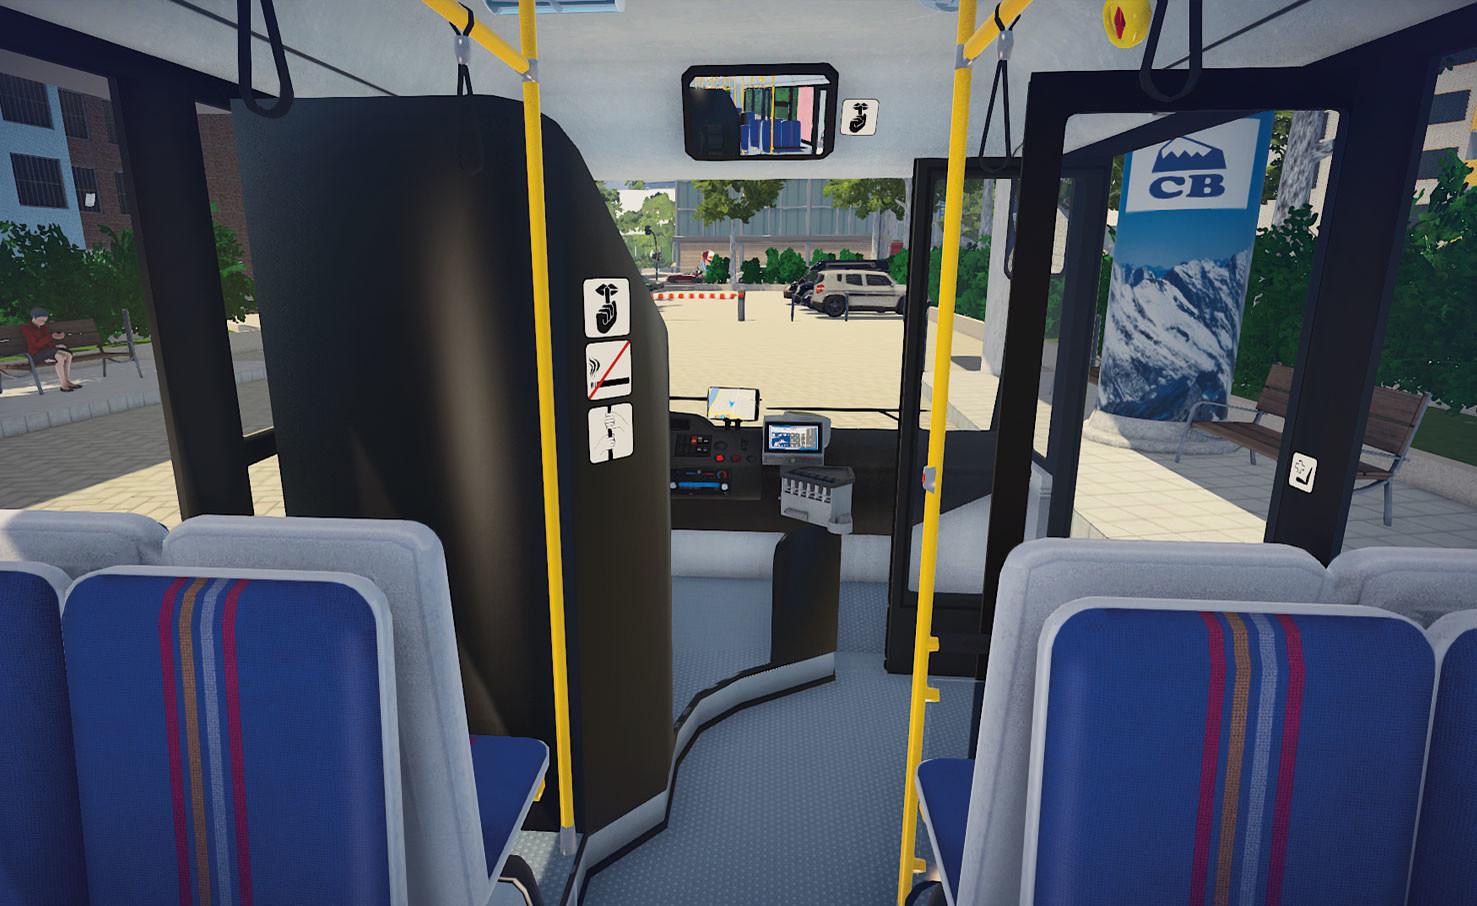 bus simulator 16 release date and trailer gamingshogun. Black Bedroom Furniture Sets. Home Design Ideas